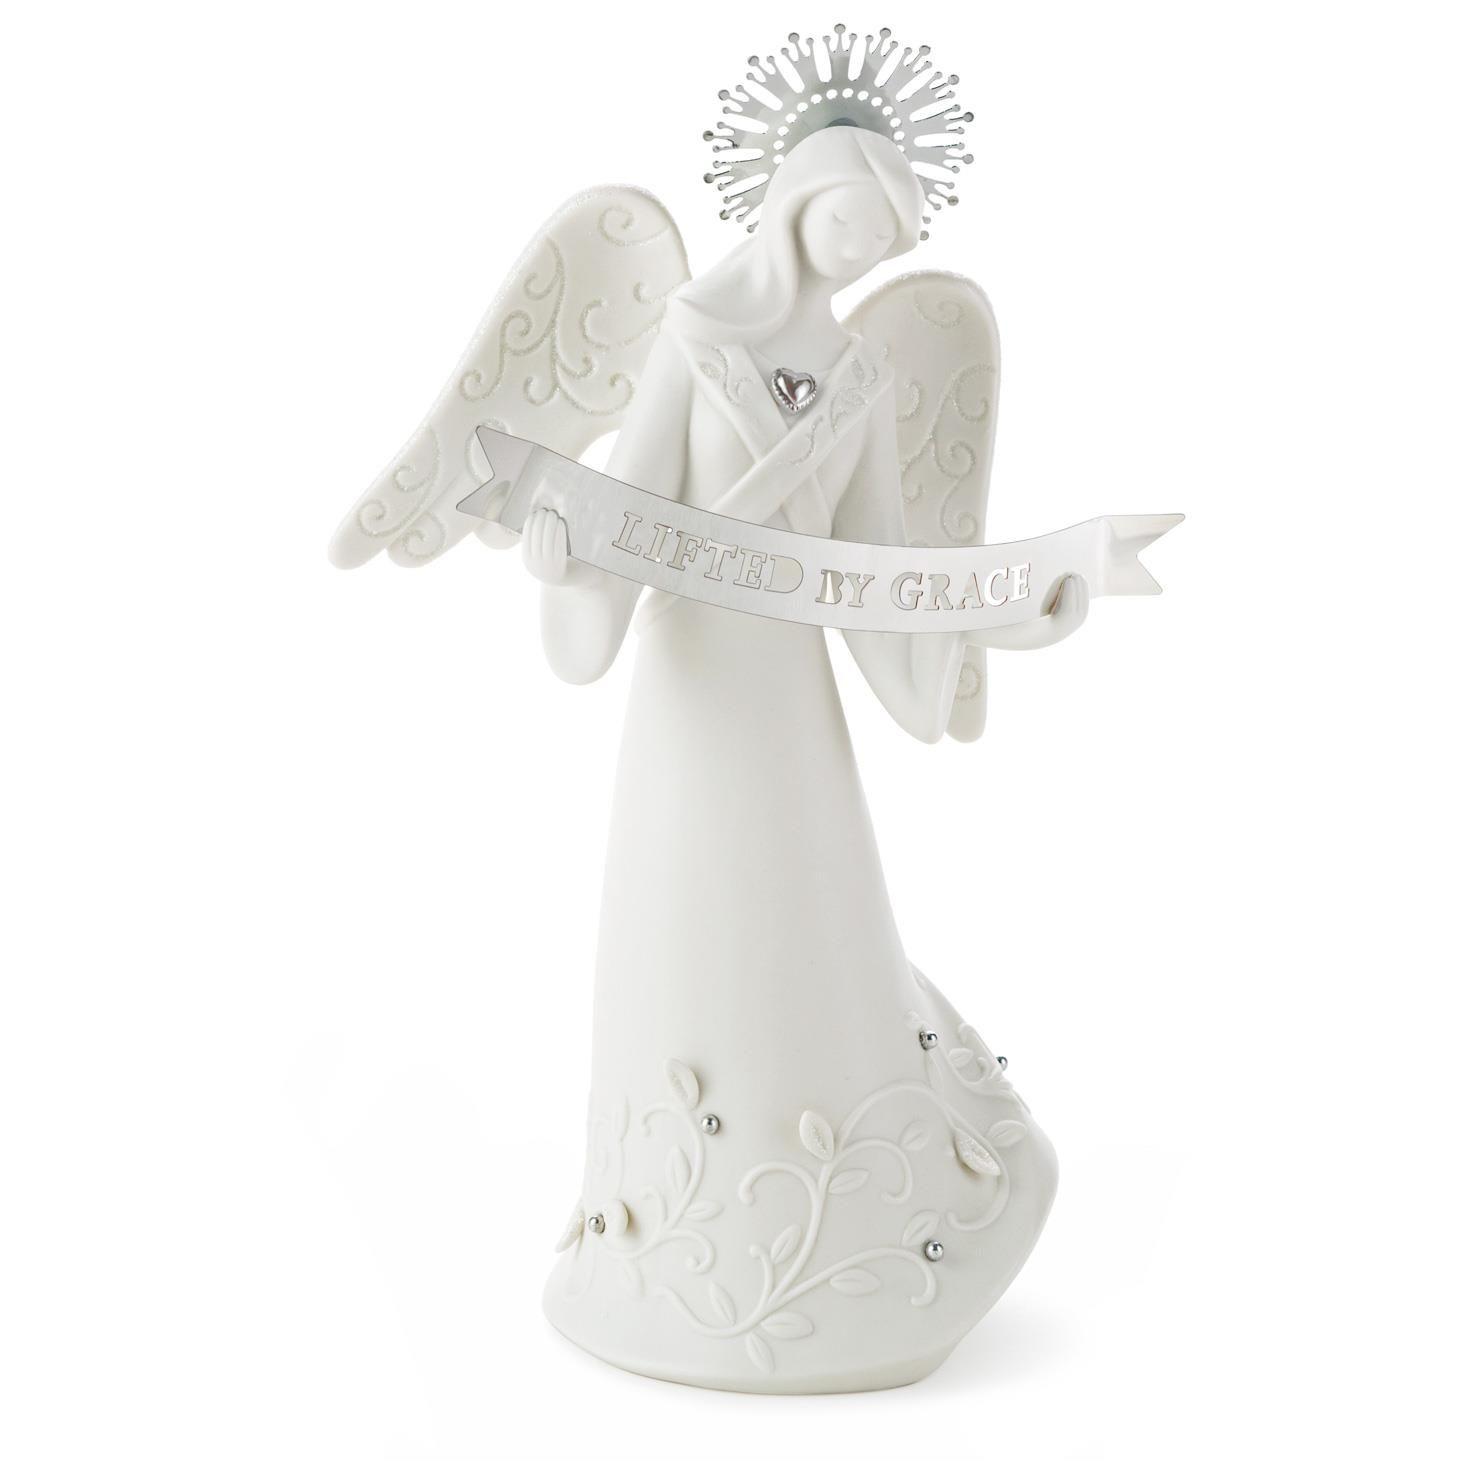 Lifted by Grace Angel Figurine - Figurines - Hallmark